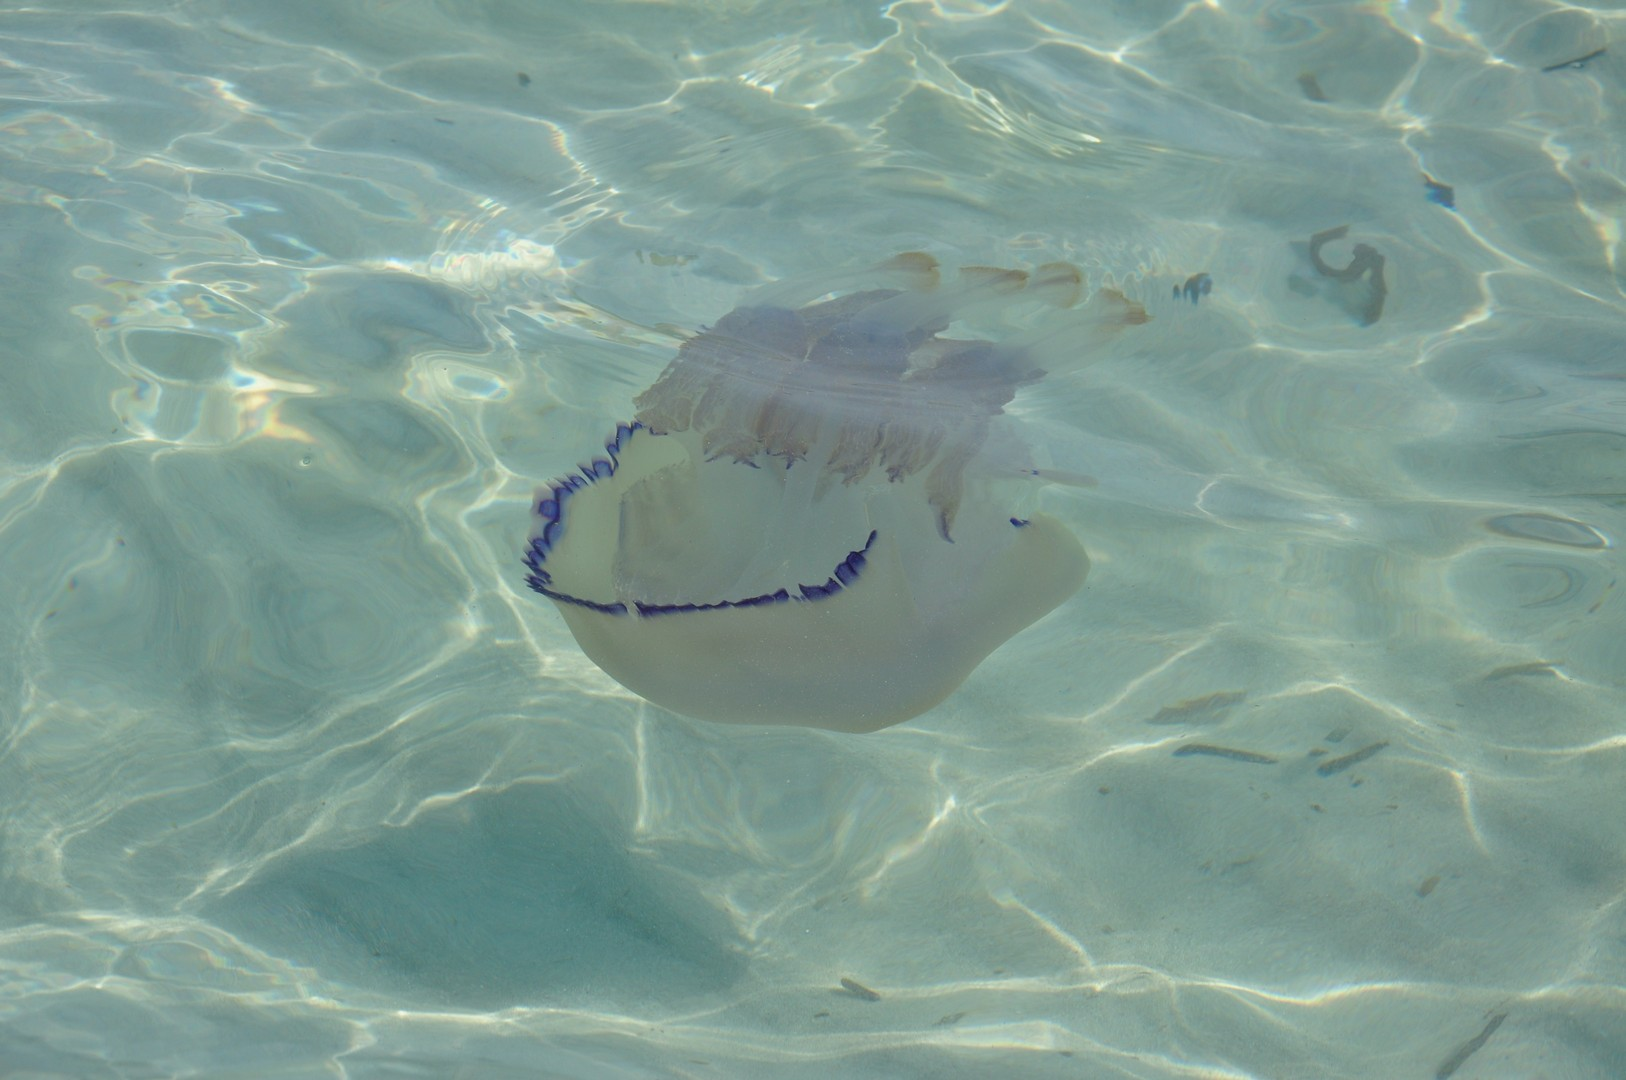 Путешествия / лайфхаки / медузы